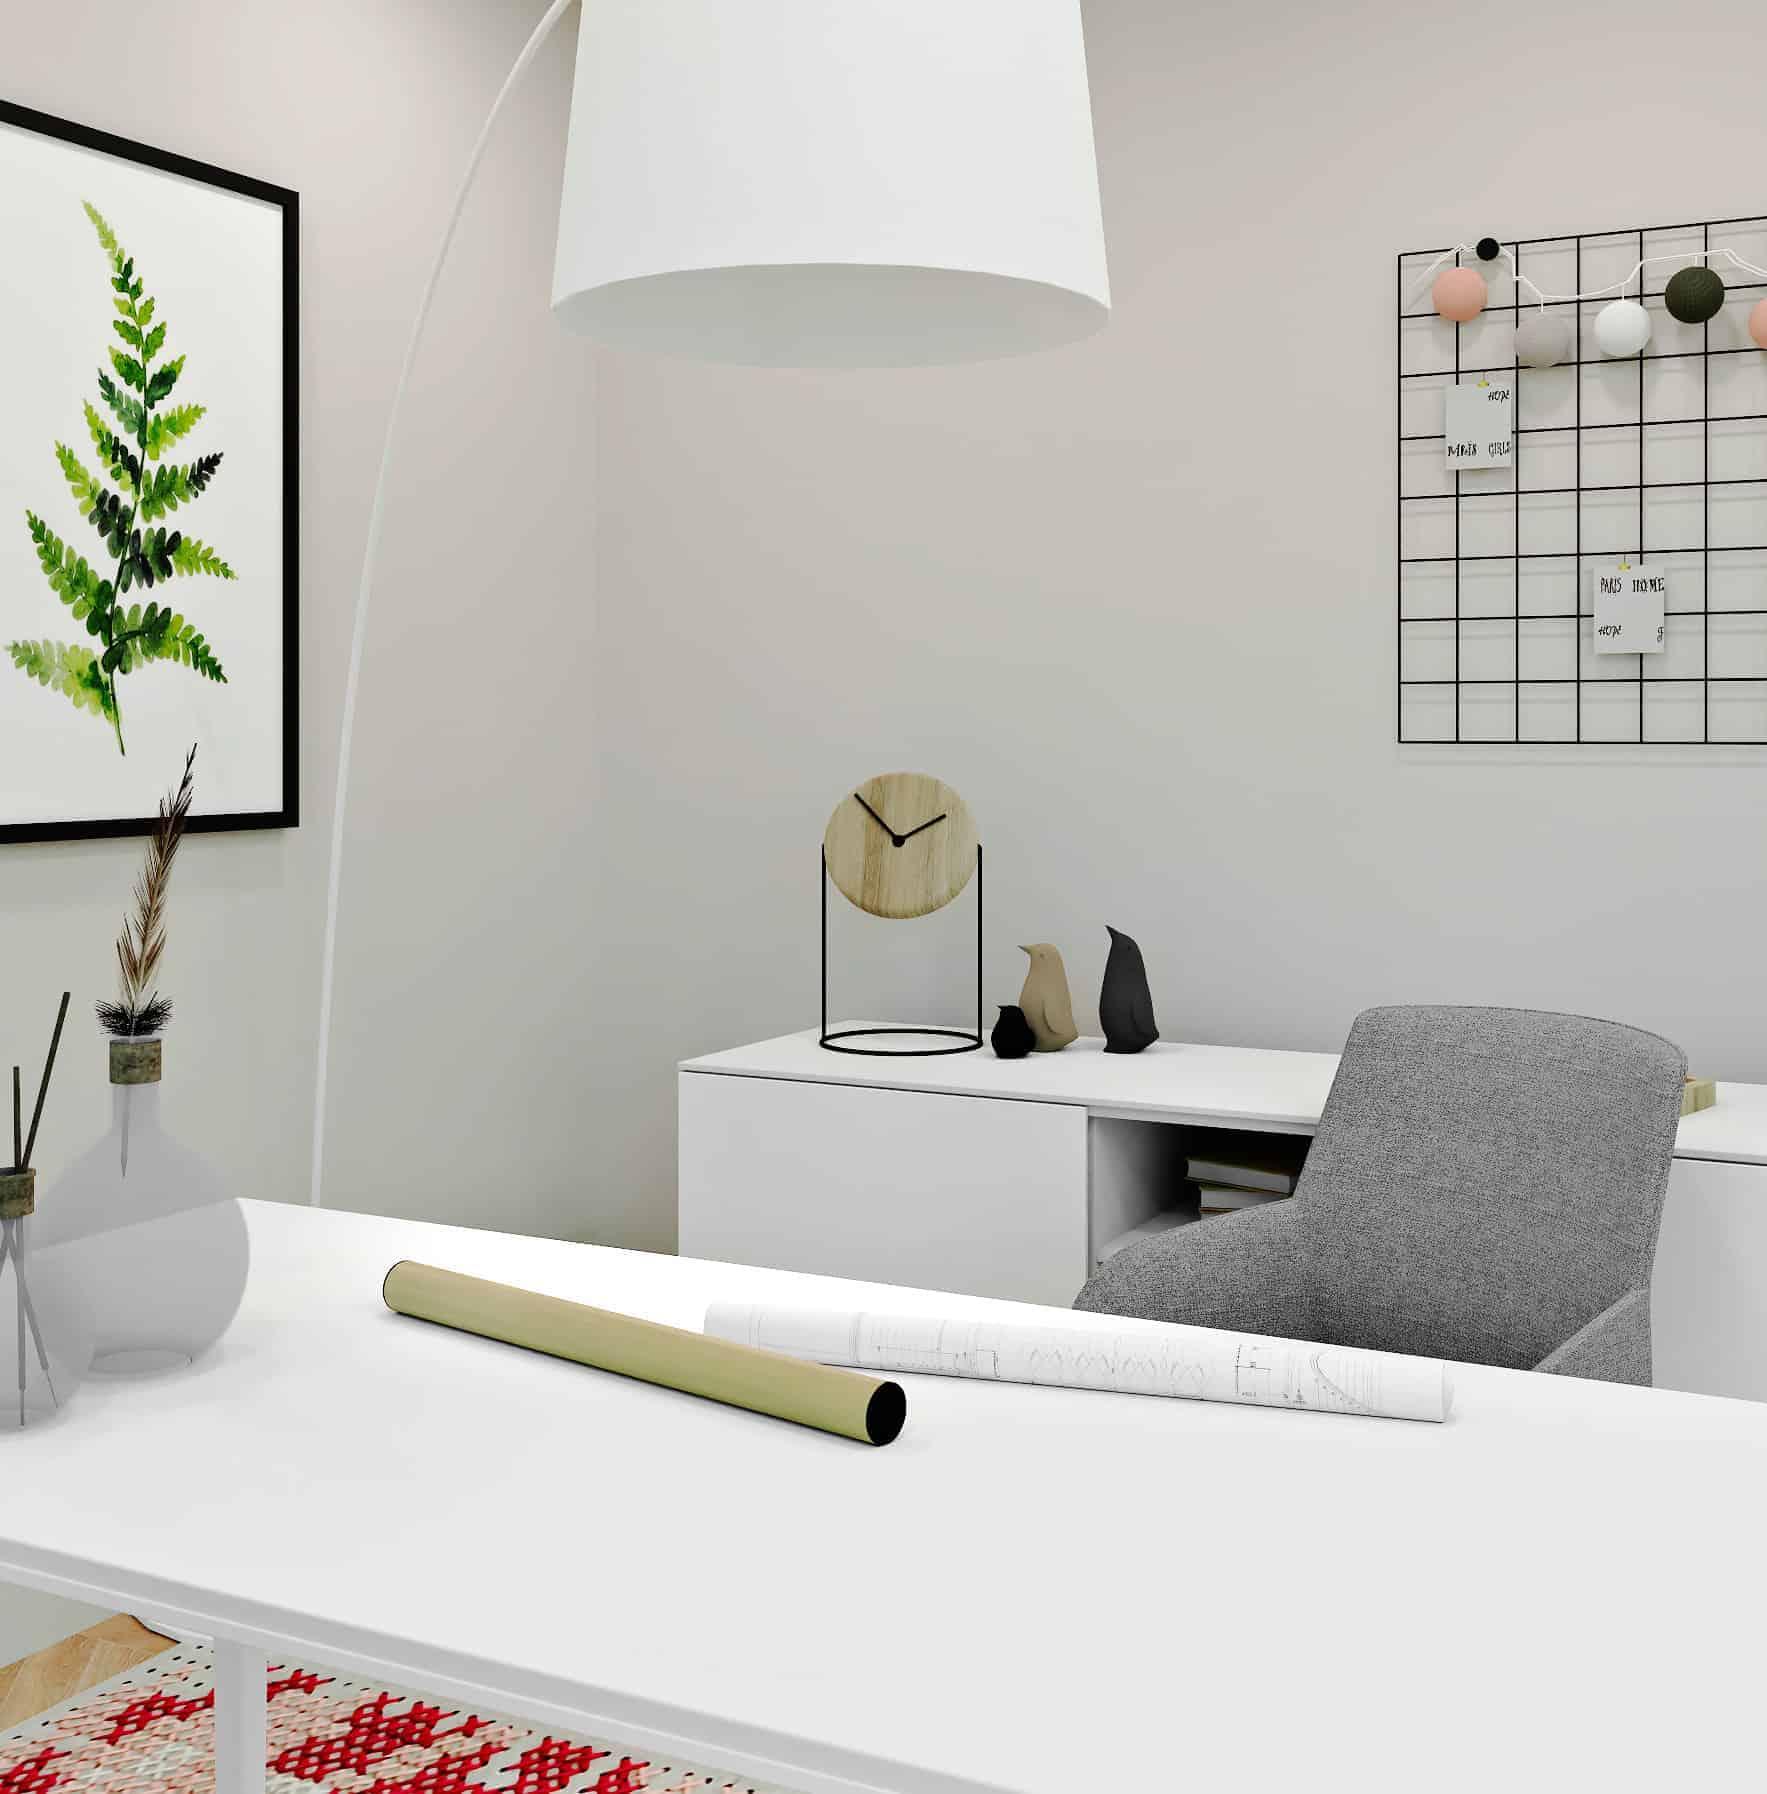 Homeoffice estilo minimalista